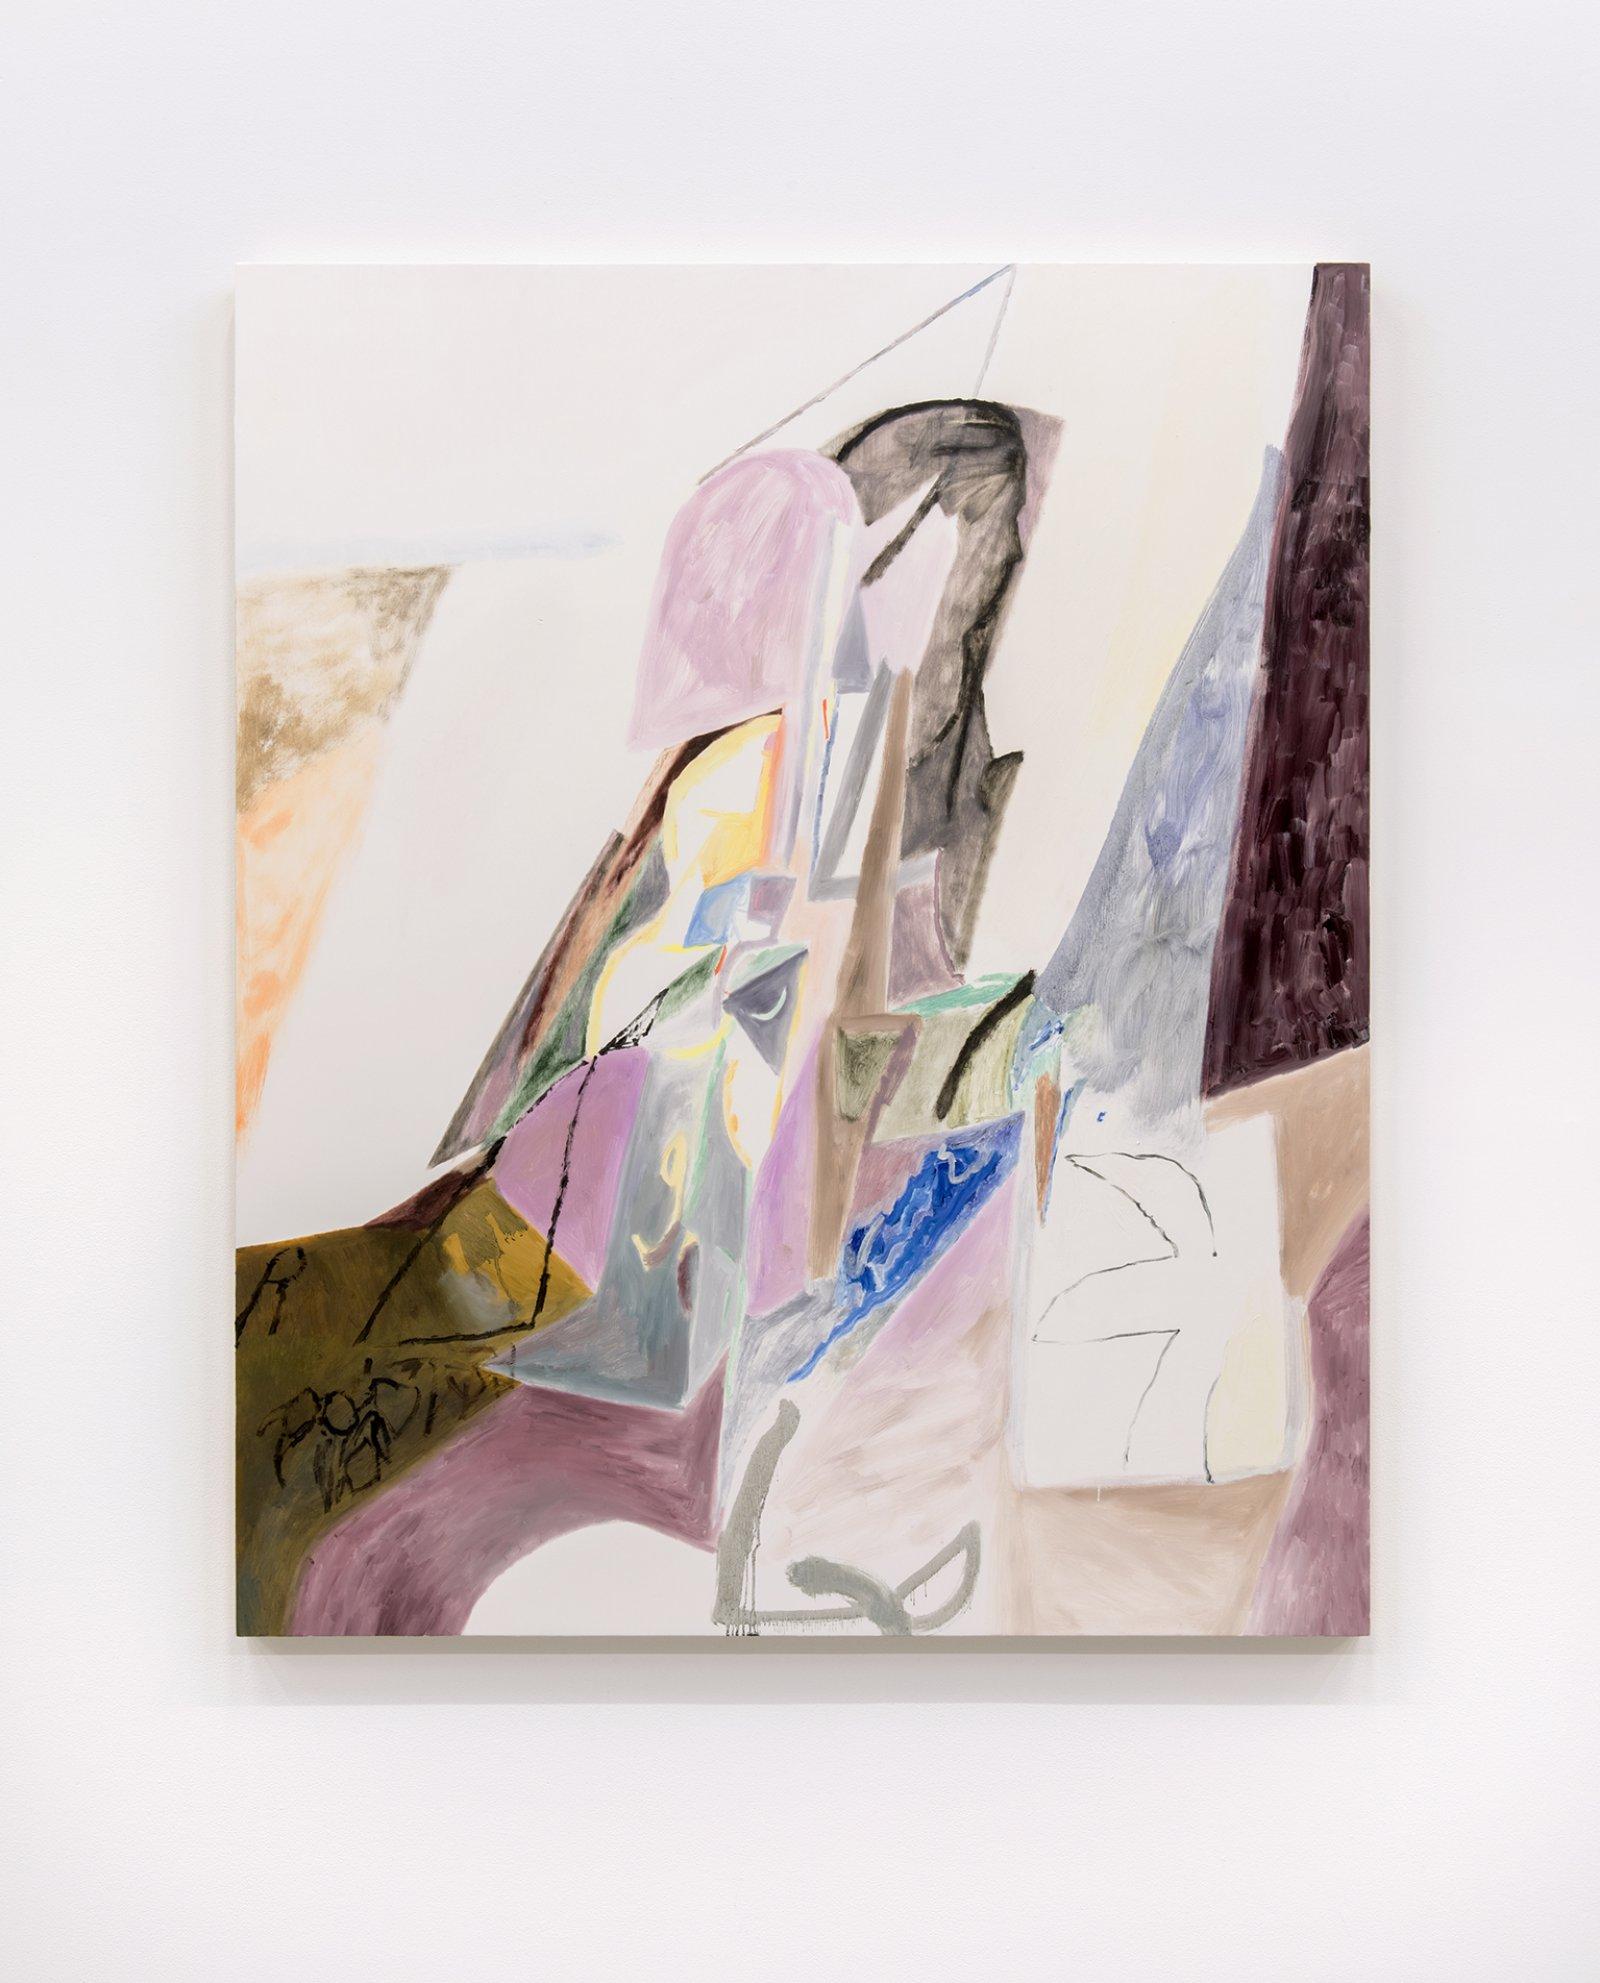 Rebecca Brewer, Flat Flower, 2013, oil on panel, 57 x 47 in. (145 x 120 cm)